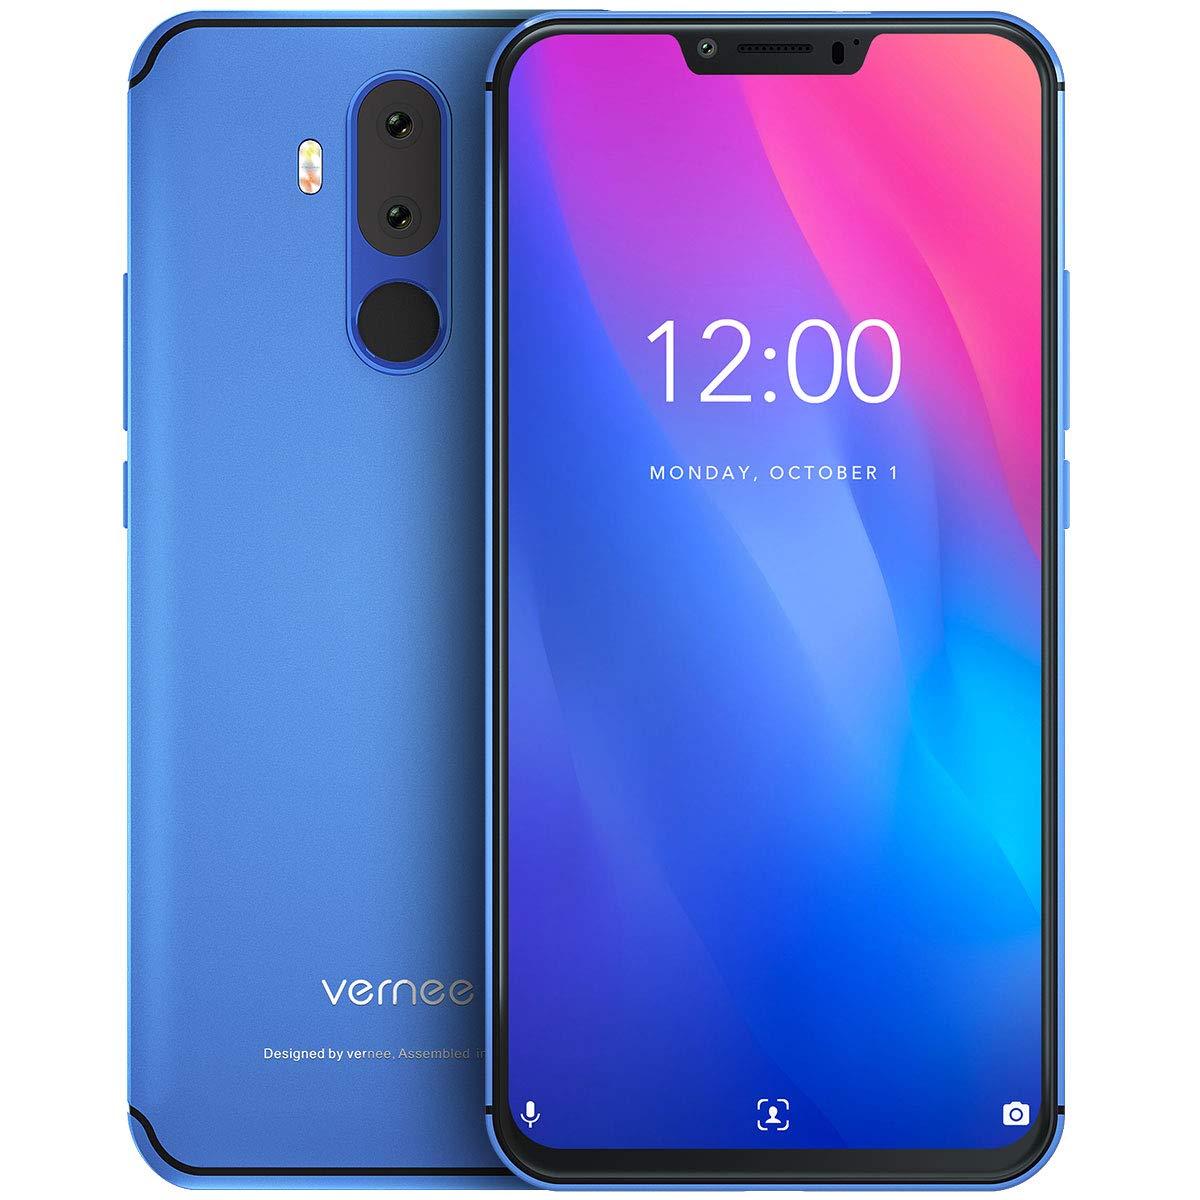 Vernee M8 Pro Teléfono Móvil Libre 6GB RAM 64GB ROM, Pantalla FHD 6.2″ Cámara Dual AI 16MP+8MP, Batería 4100mAh Carga QI Inalámbrica Dual SIM 4G Volte, Android 8.1 Face ID Octa-Core 2GHz, NFC – Azul